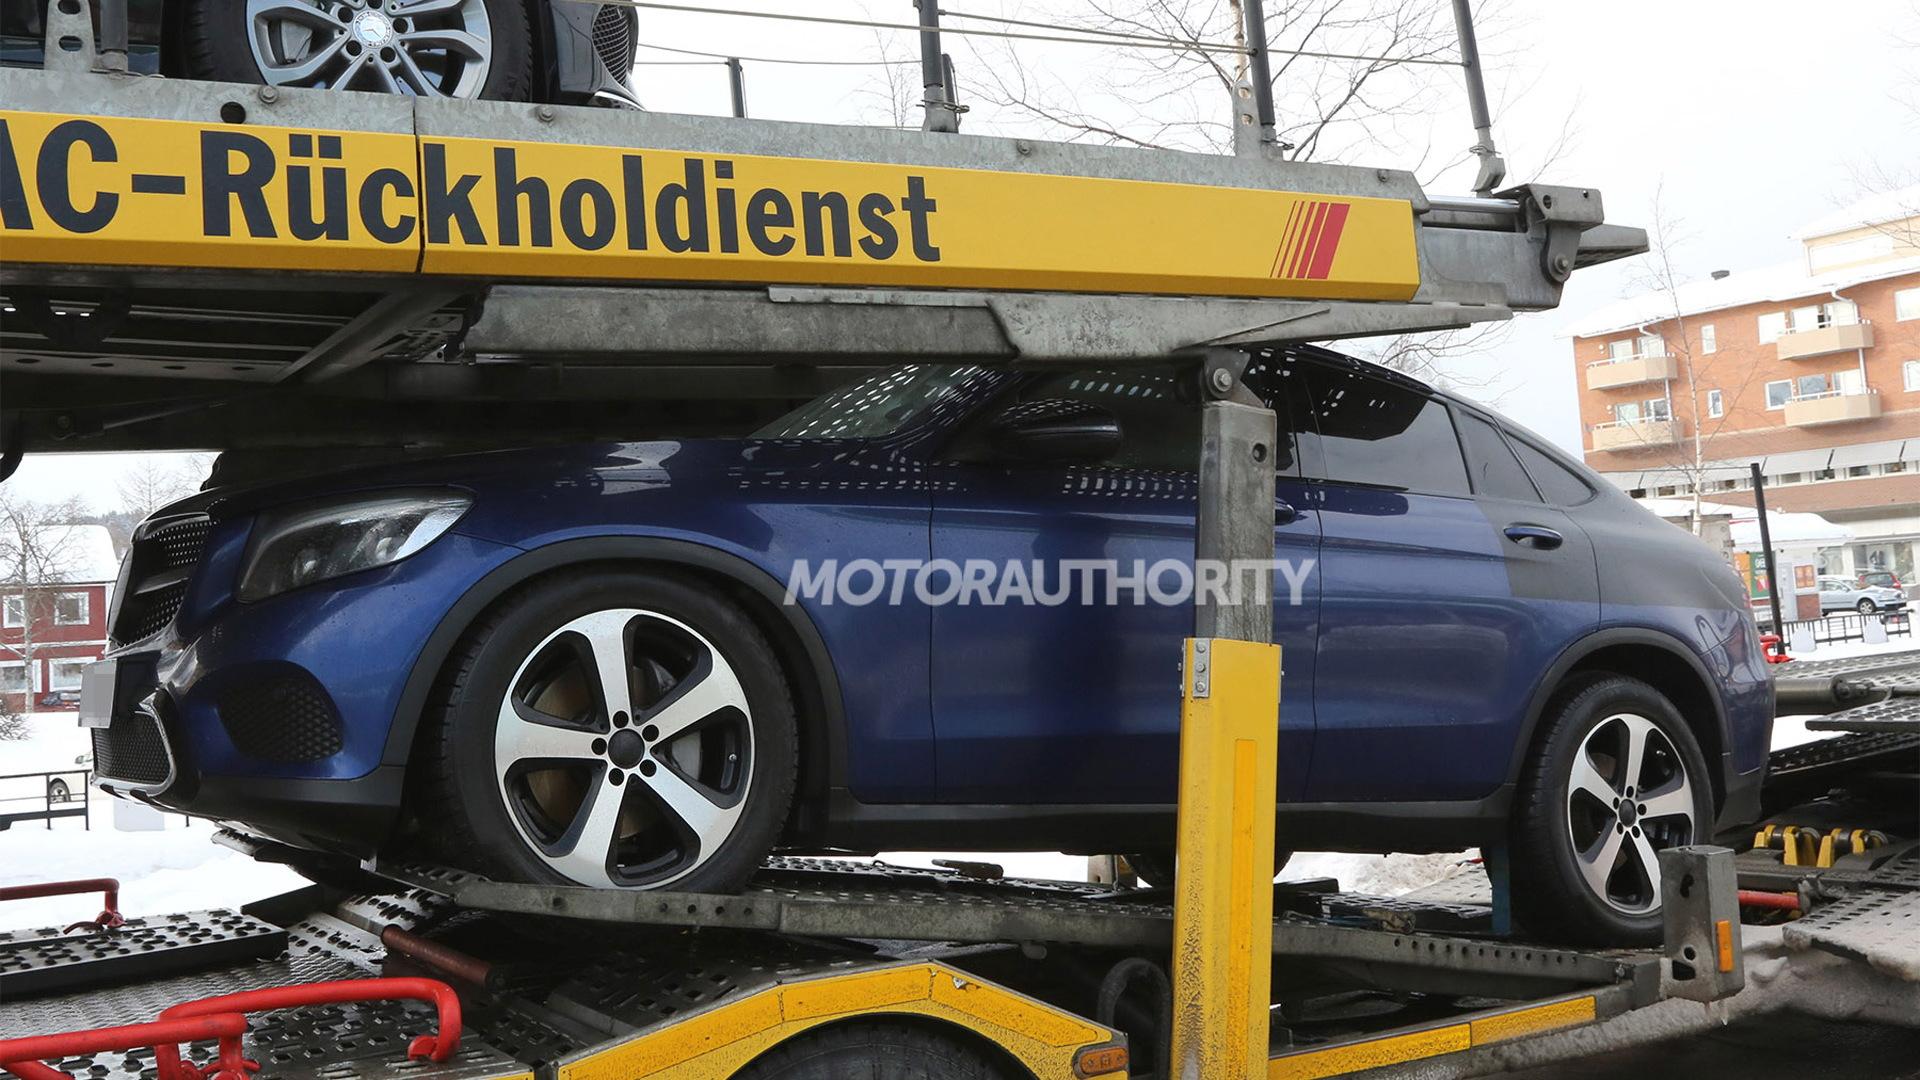 2017 Mercedes-Benz GLC Coupe spy shots - Image via S. Baldauf/SB-Medien